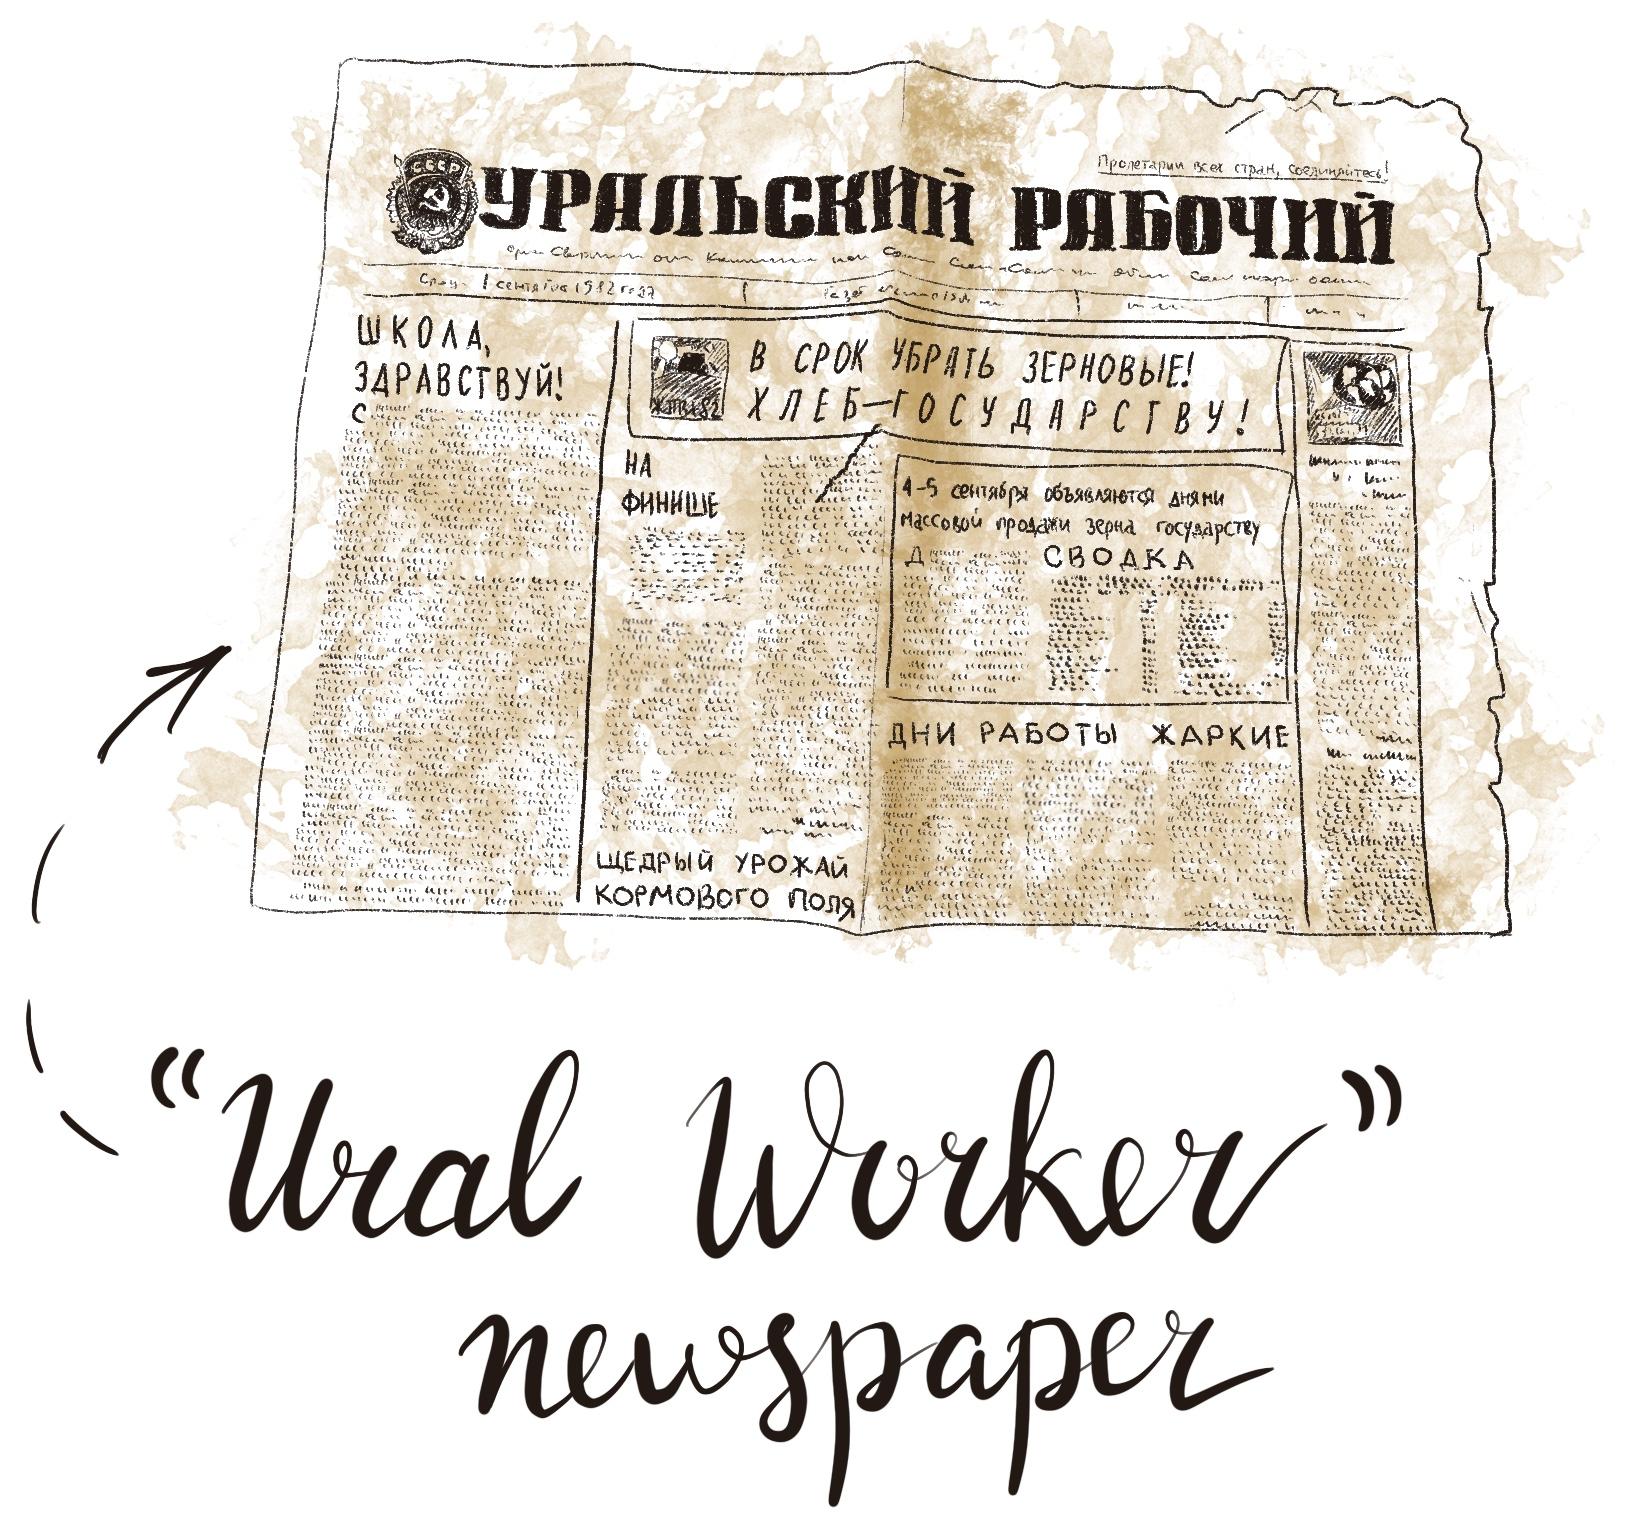 Ural_worker